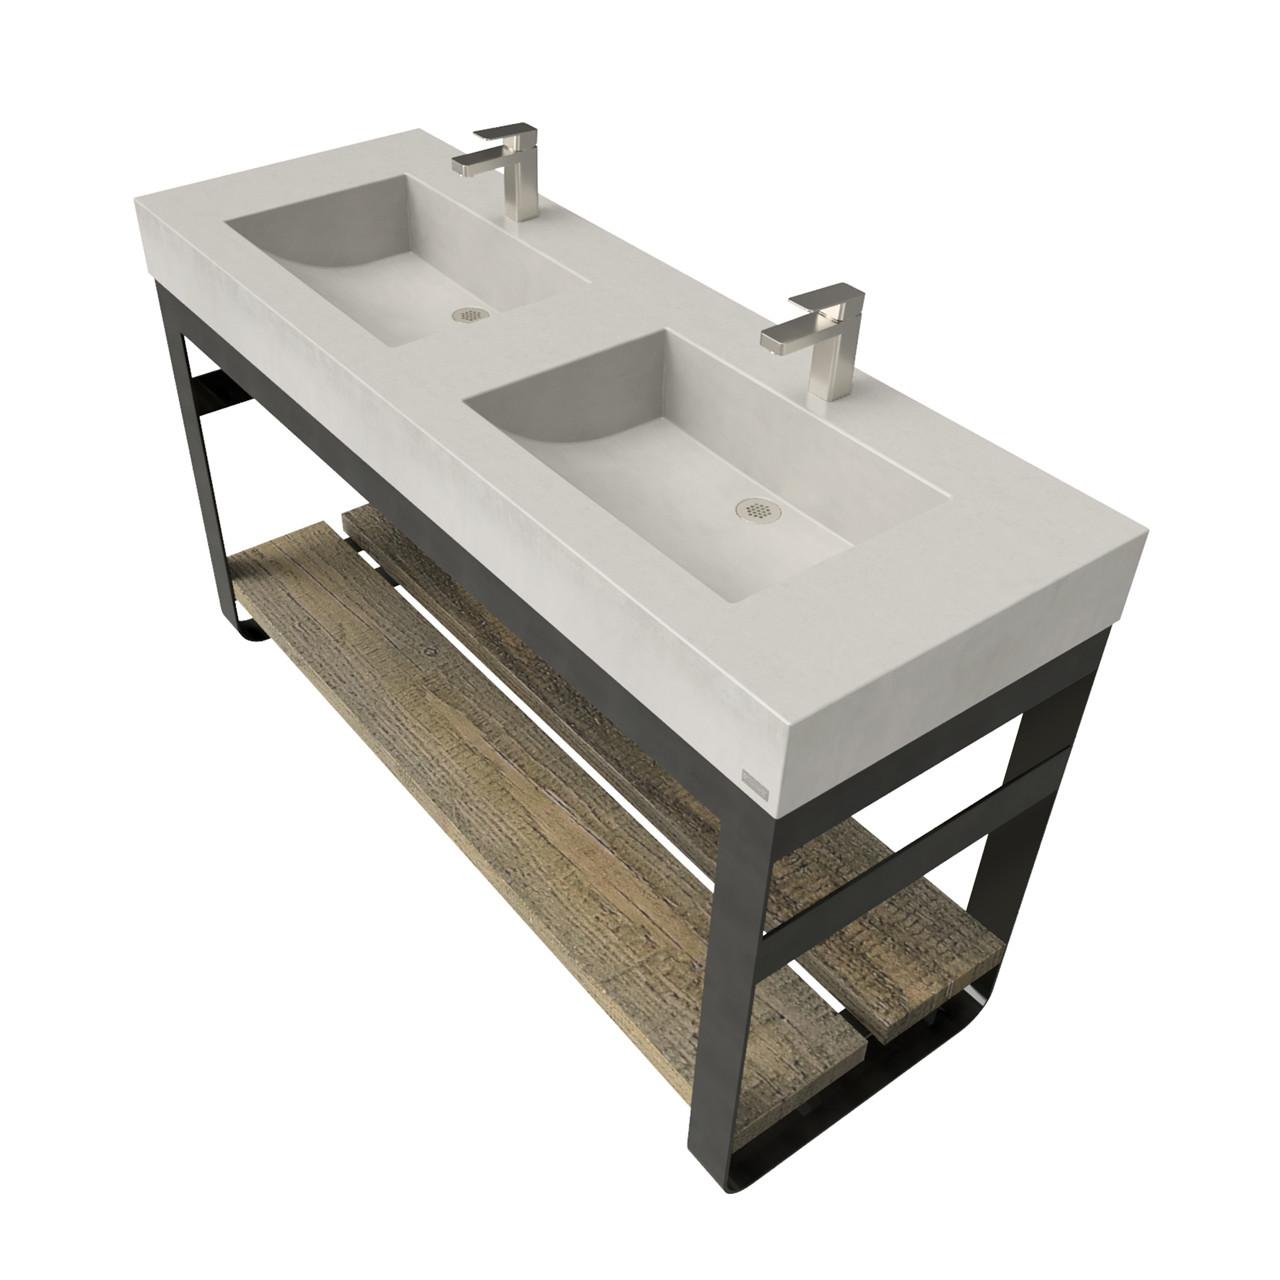 60 Outland Vanity With Double Concrete Half Trough Sinks Trueform Concrete